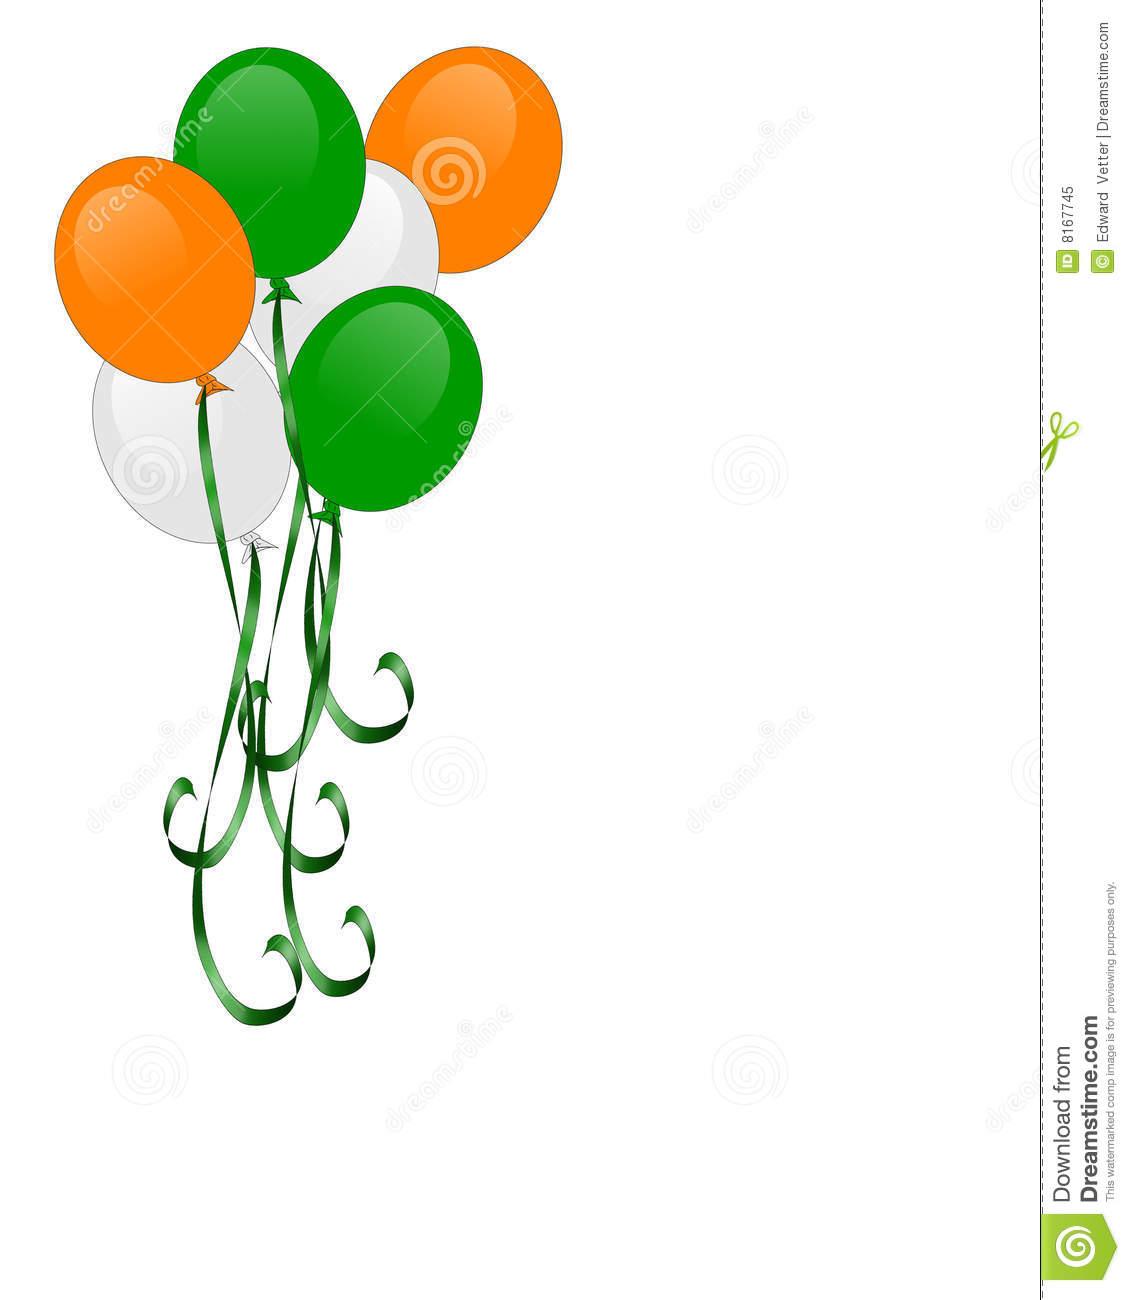 1130x1300 Balloon Clipart St Patricks Day